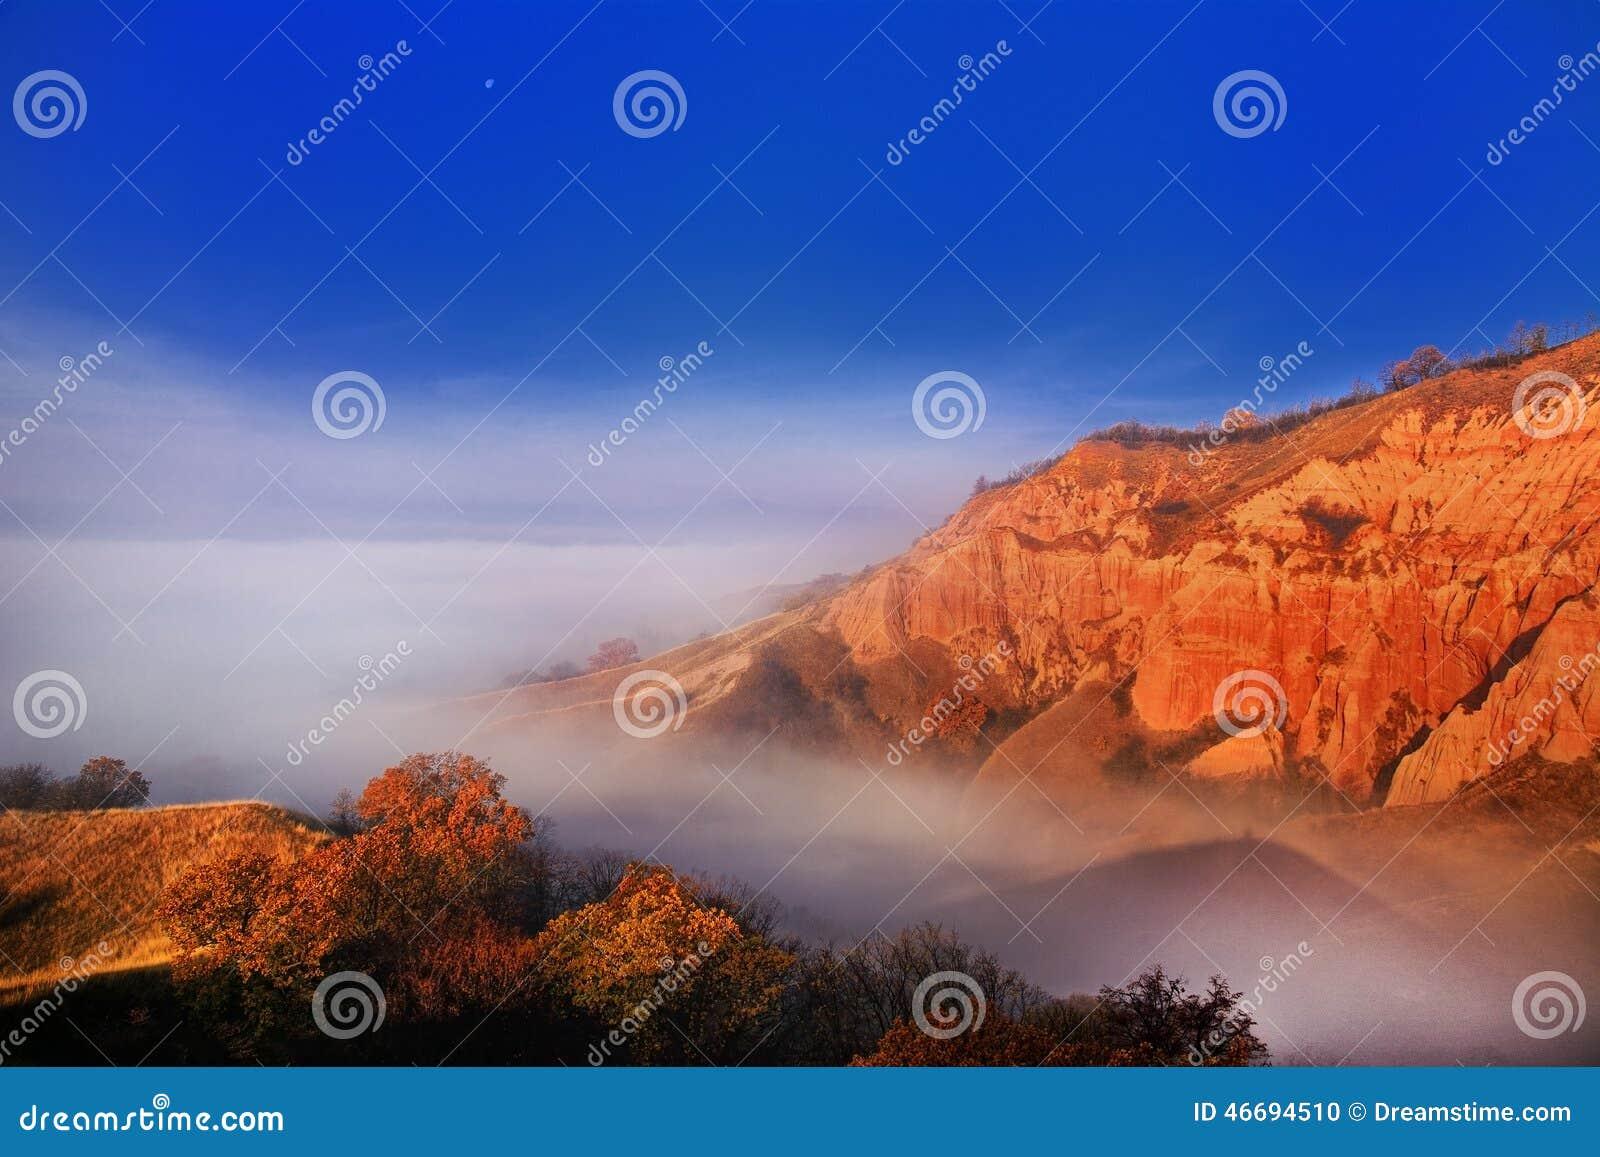 Red Ravine shrouded in fog stock photo  Image of peak - 46694510